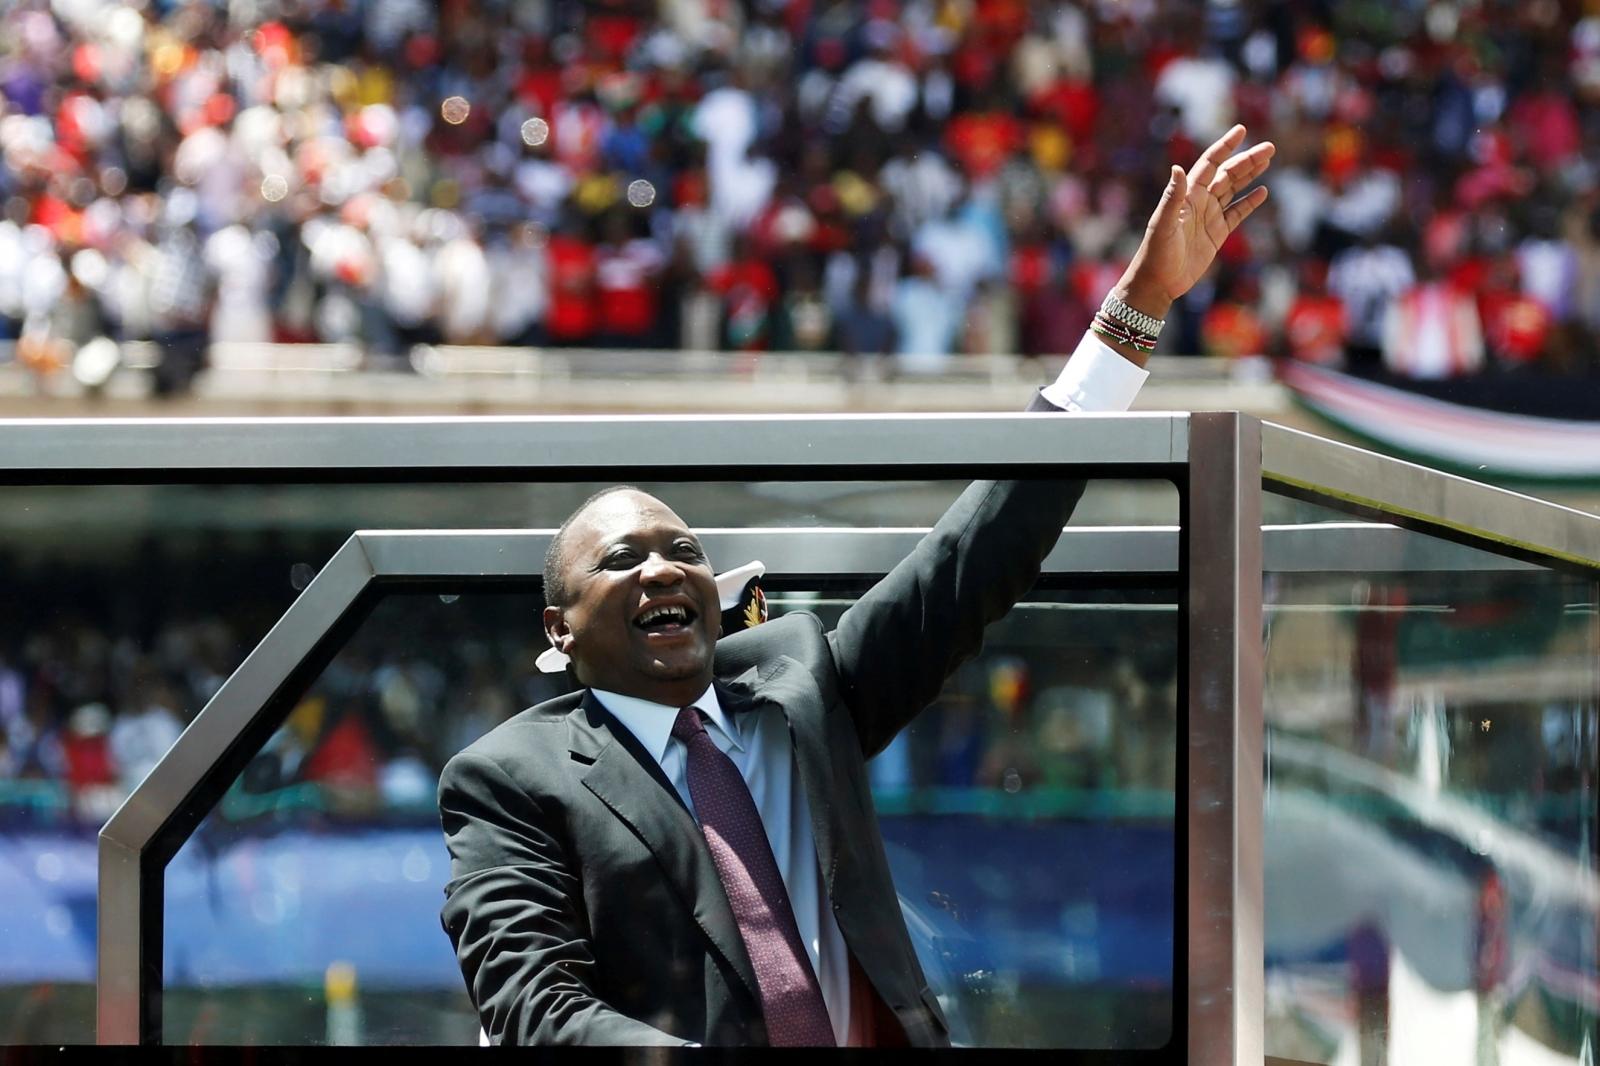 Kenya's President Uhuru Kenyatta waves upon his arrival to his inauguration ceremony where he will be sworn in as president at Kasarani Stadium in Nairobi, Kenya